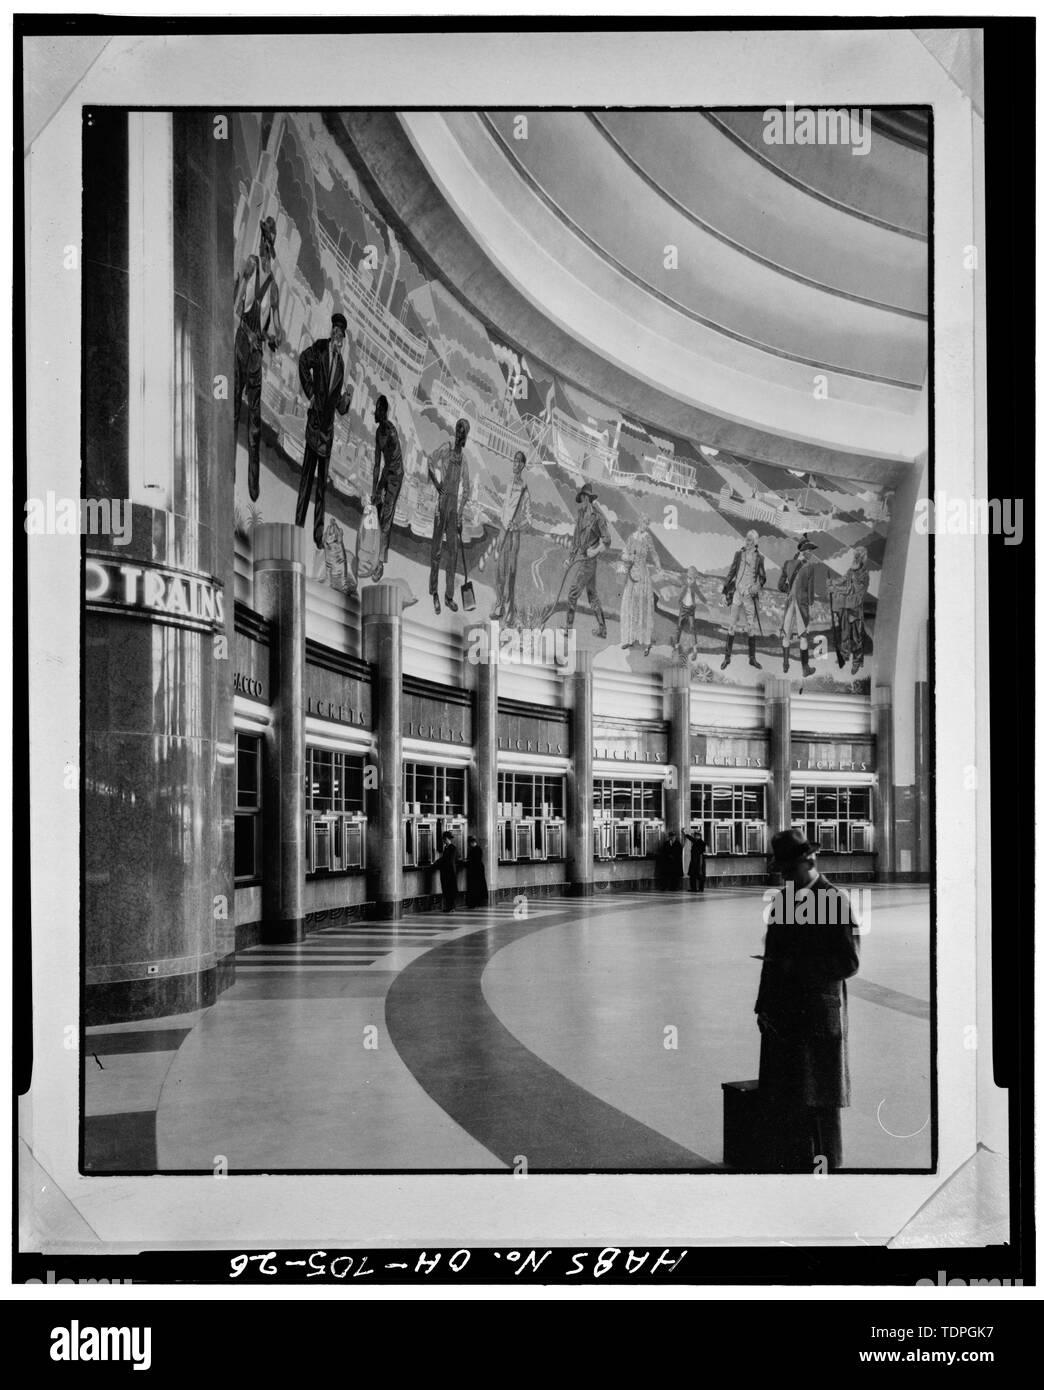 MURAL AND TICKET WICKETS, NORTHWEST QUADRANT OF CONCOURSE, LOOKING NORTH - Cincinnati Union Terminal, 1301 Western Avenue, Cincinnati, Hamilton County, OH - Stock Image